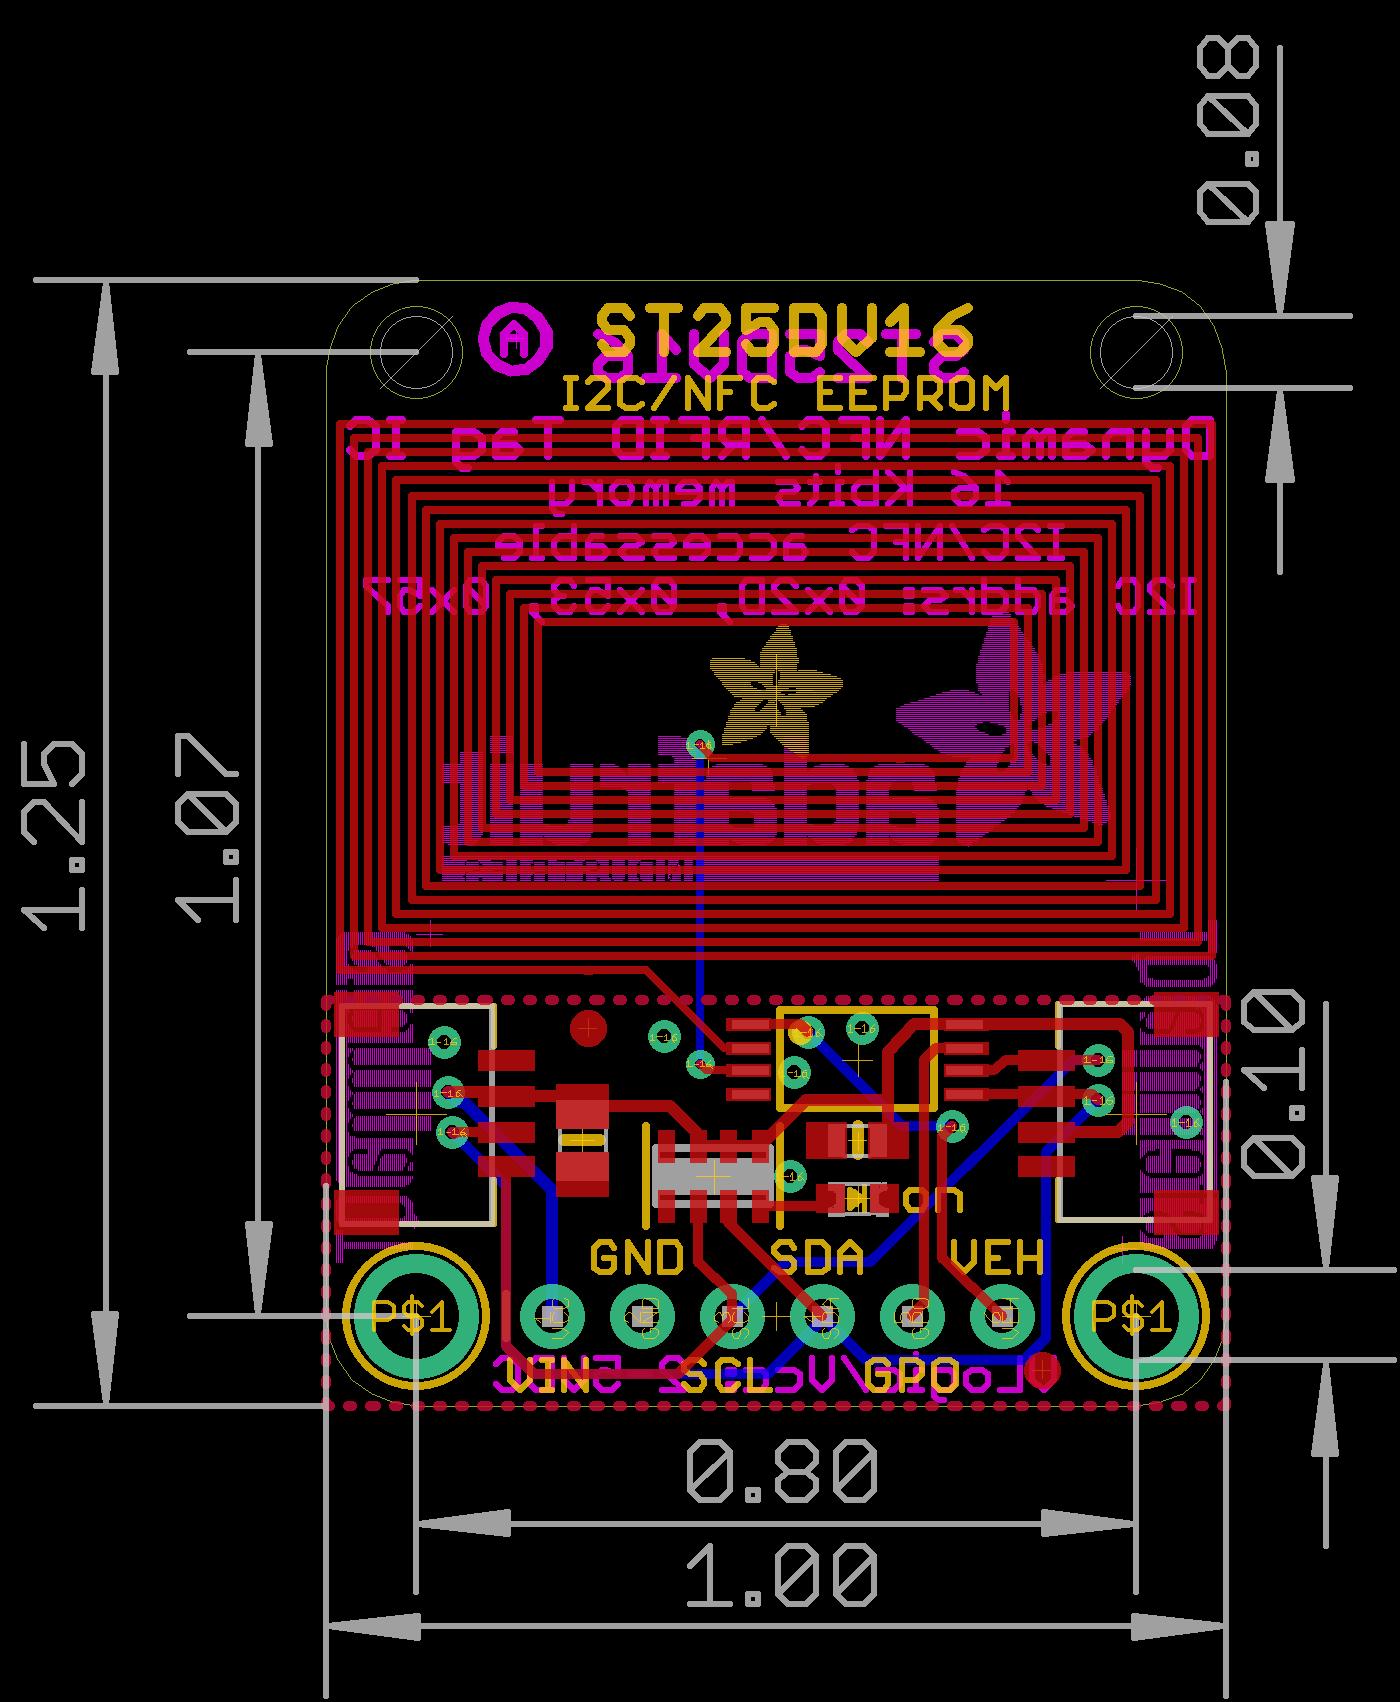 adafruit_products_ST25DV16_fab_print.png